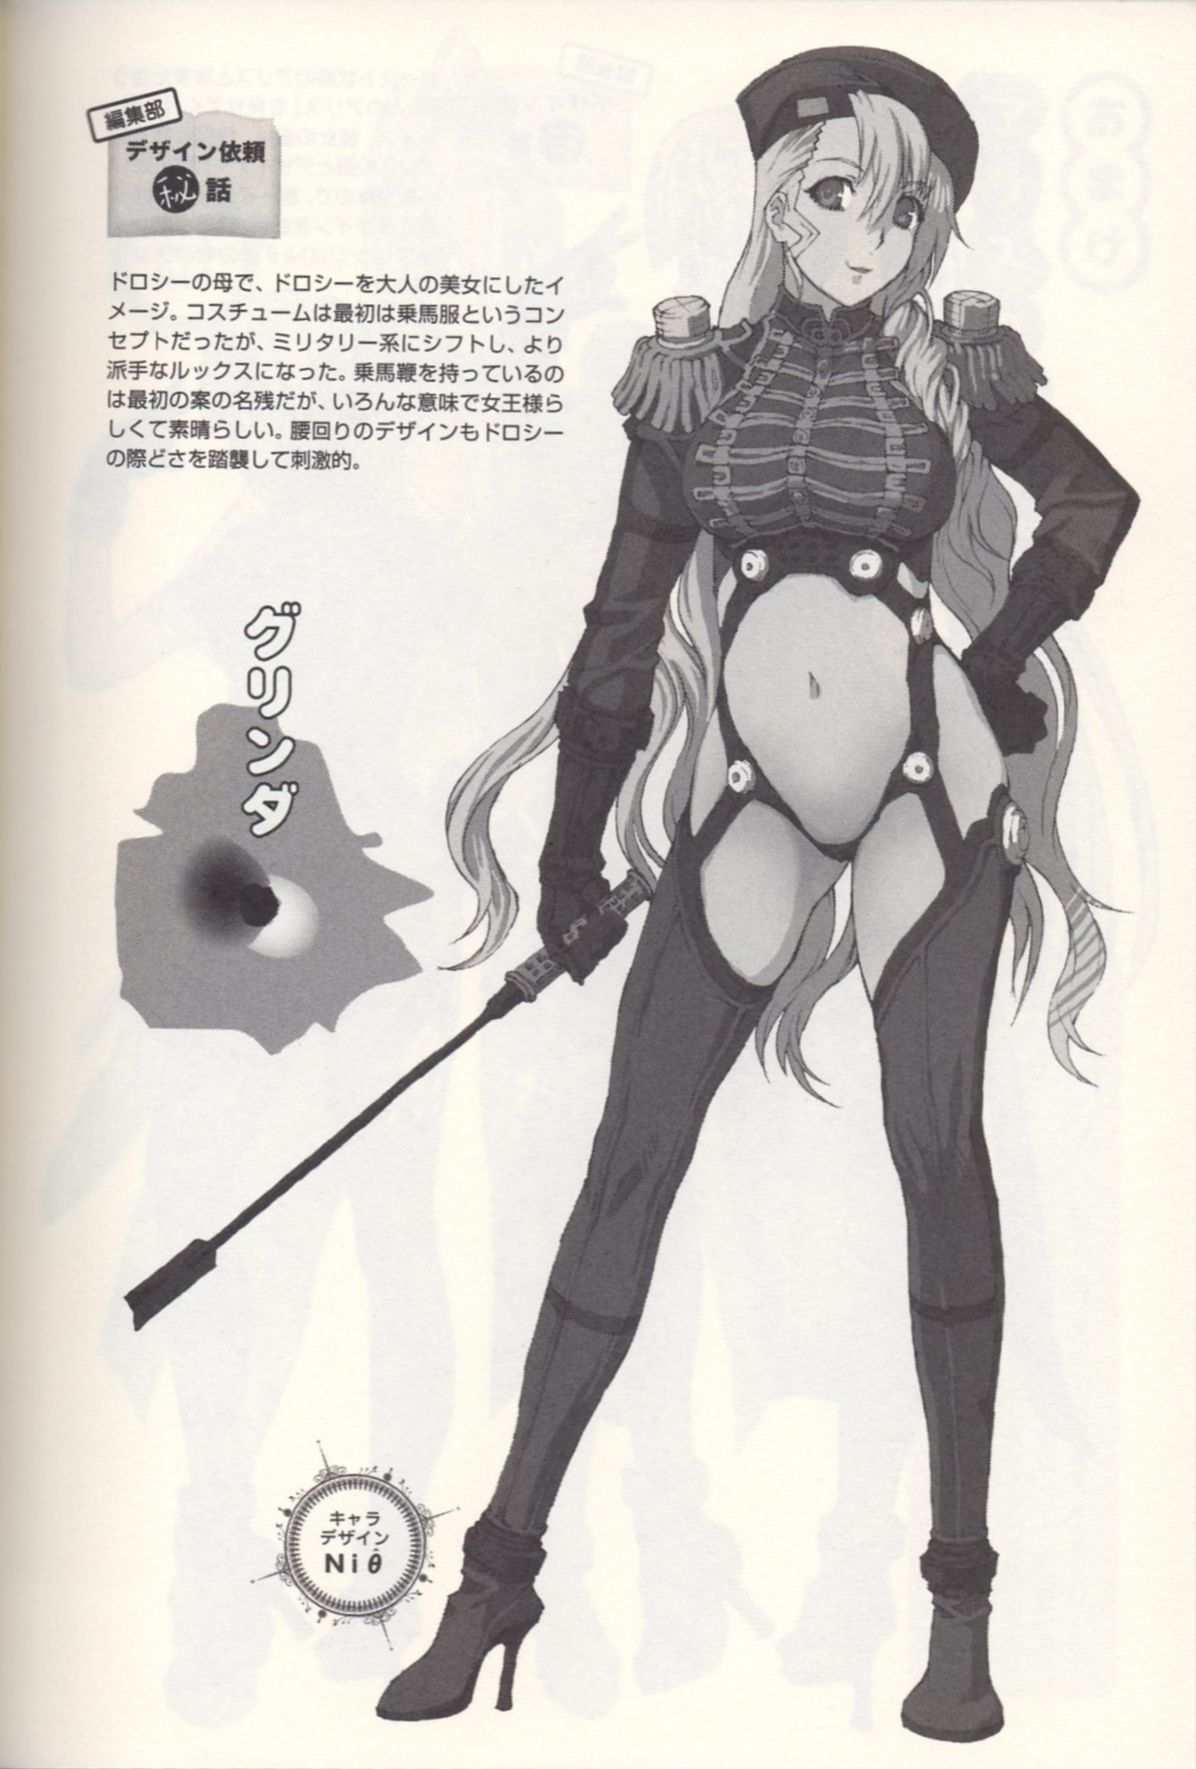 Glinda Anime, Illustration art, Queen's blade